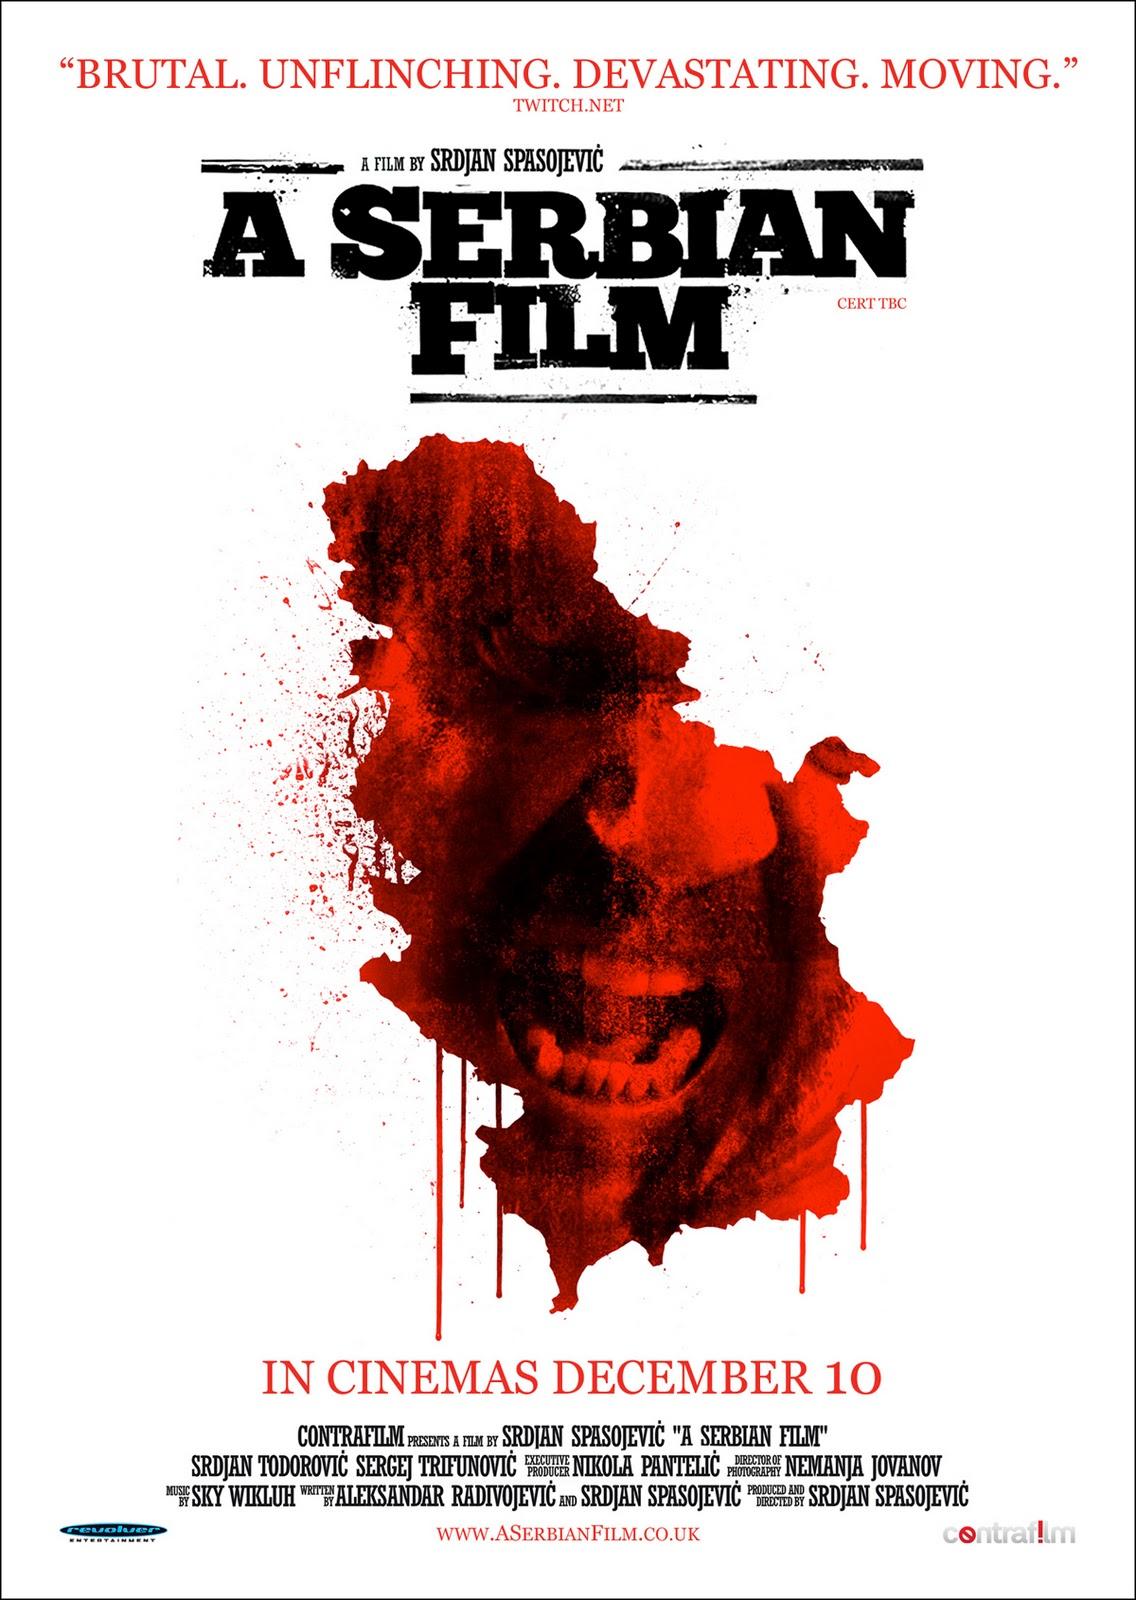 http://2.bp.blogspot.com/-6phK4wsnrNk/TyiDFBup6HI/AAAAAAAADSk/kZUJQBnwPGw/s1600/A-Serbian-Film-Movie-Poster-danterants-blogspot-com.jpg